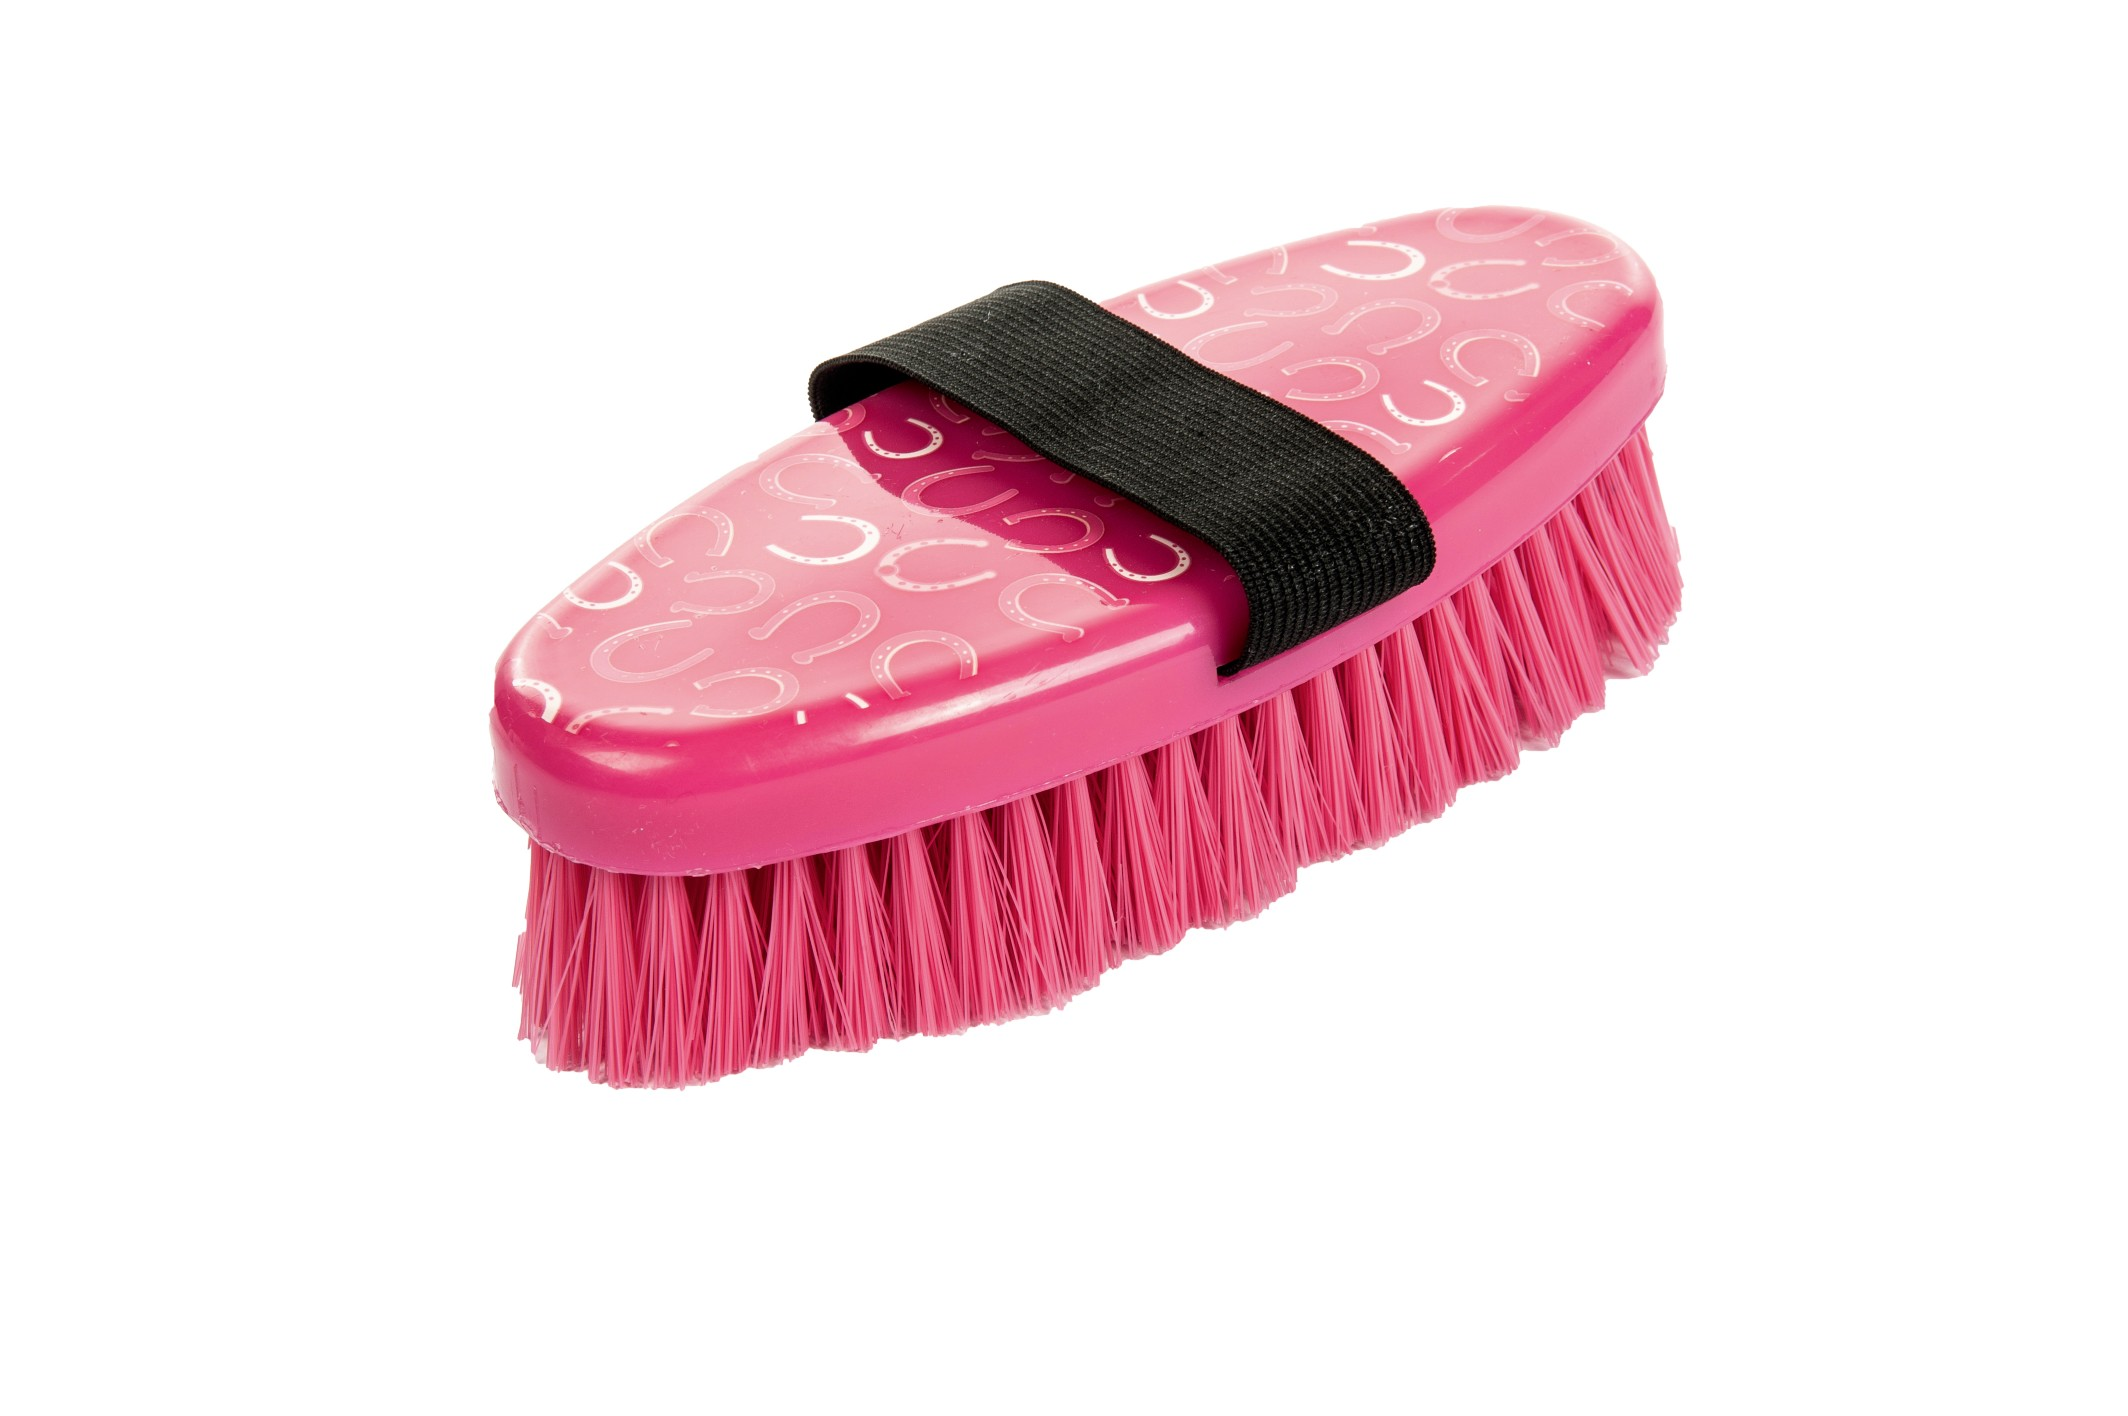 Hkm Horse Shoe Body - Pink